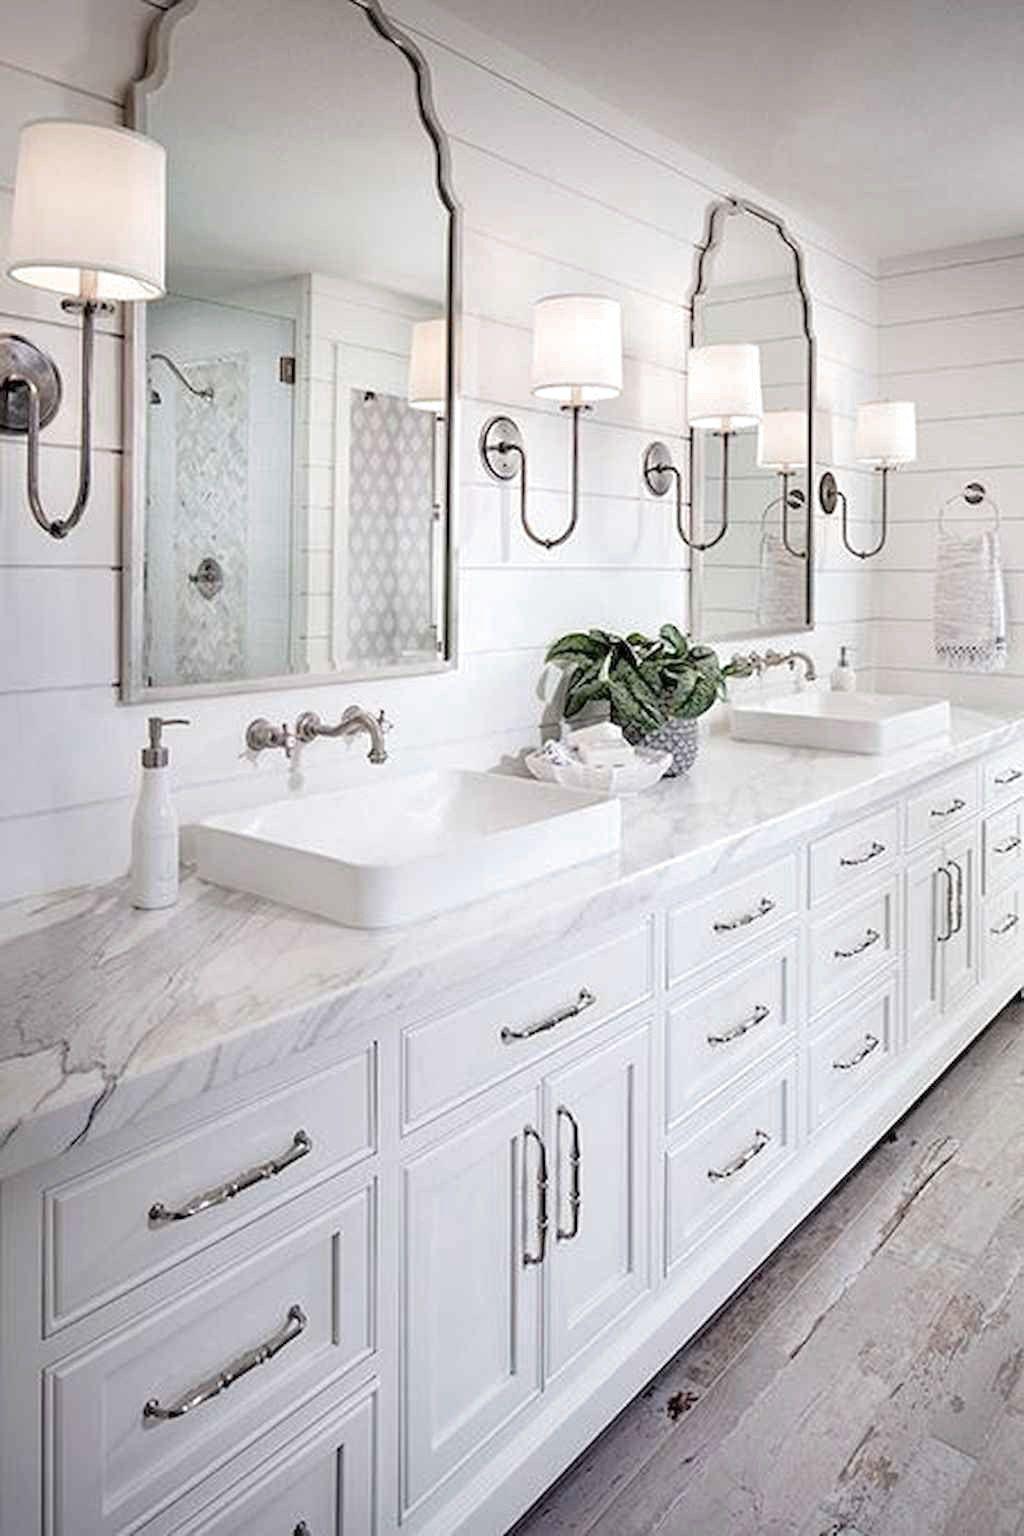 60 Amazing Farmhouse Bathroom Decor Ideas Farmhousebathroom Bathroomdecor Bathroom Vanity Decor Bathroom Design Bathroom Interior